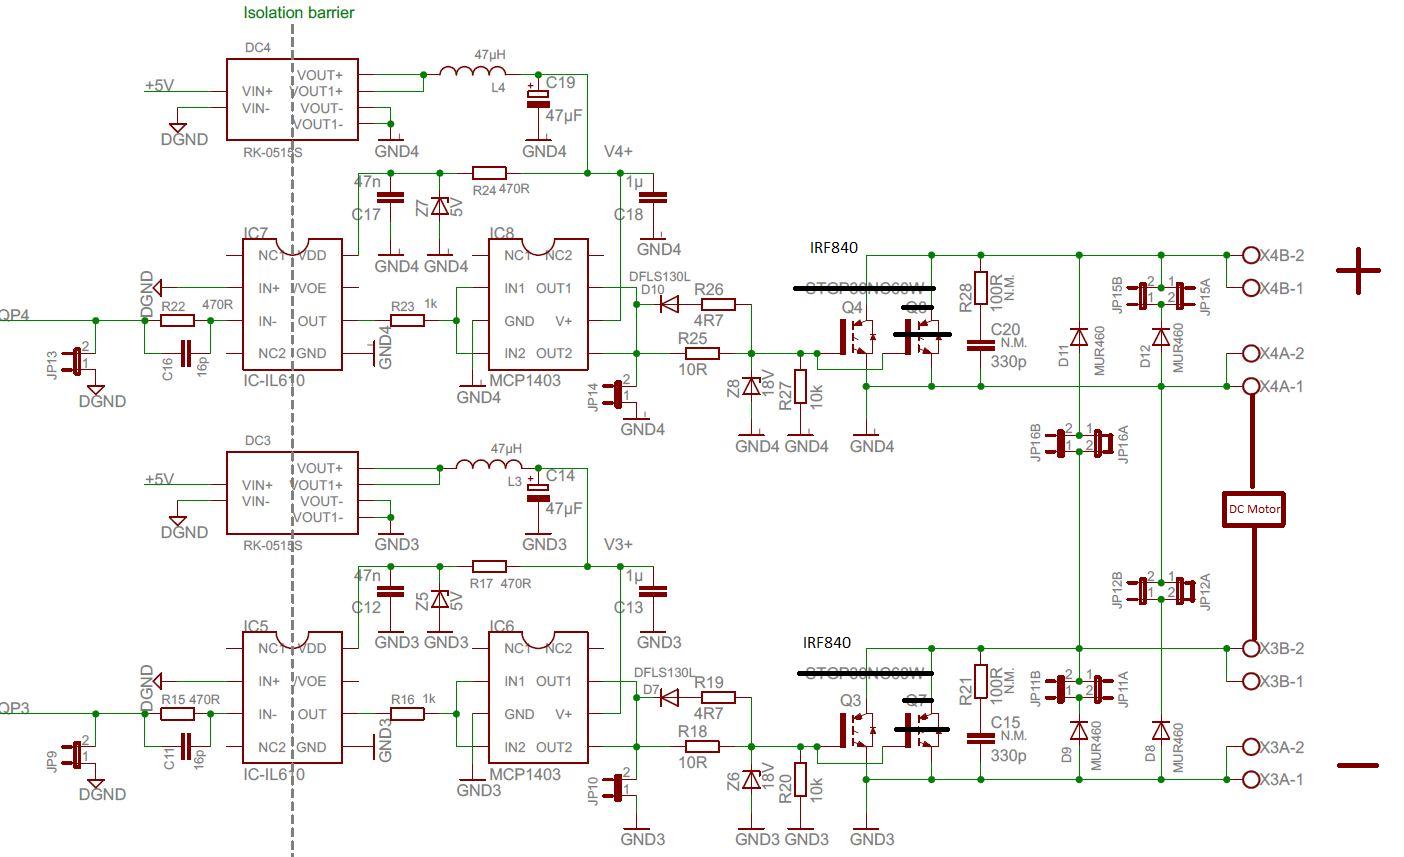 H Bridge High Side N Fet Frage Zu Schaltplan Circuit Diagram Preview Image For Nfet